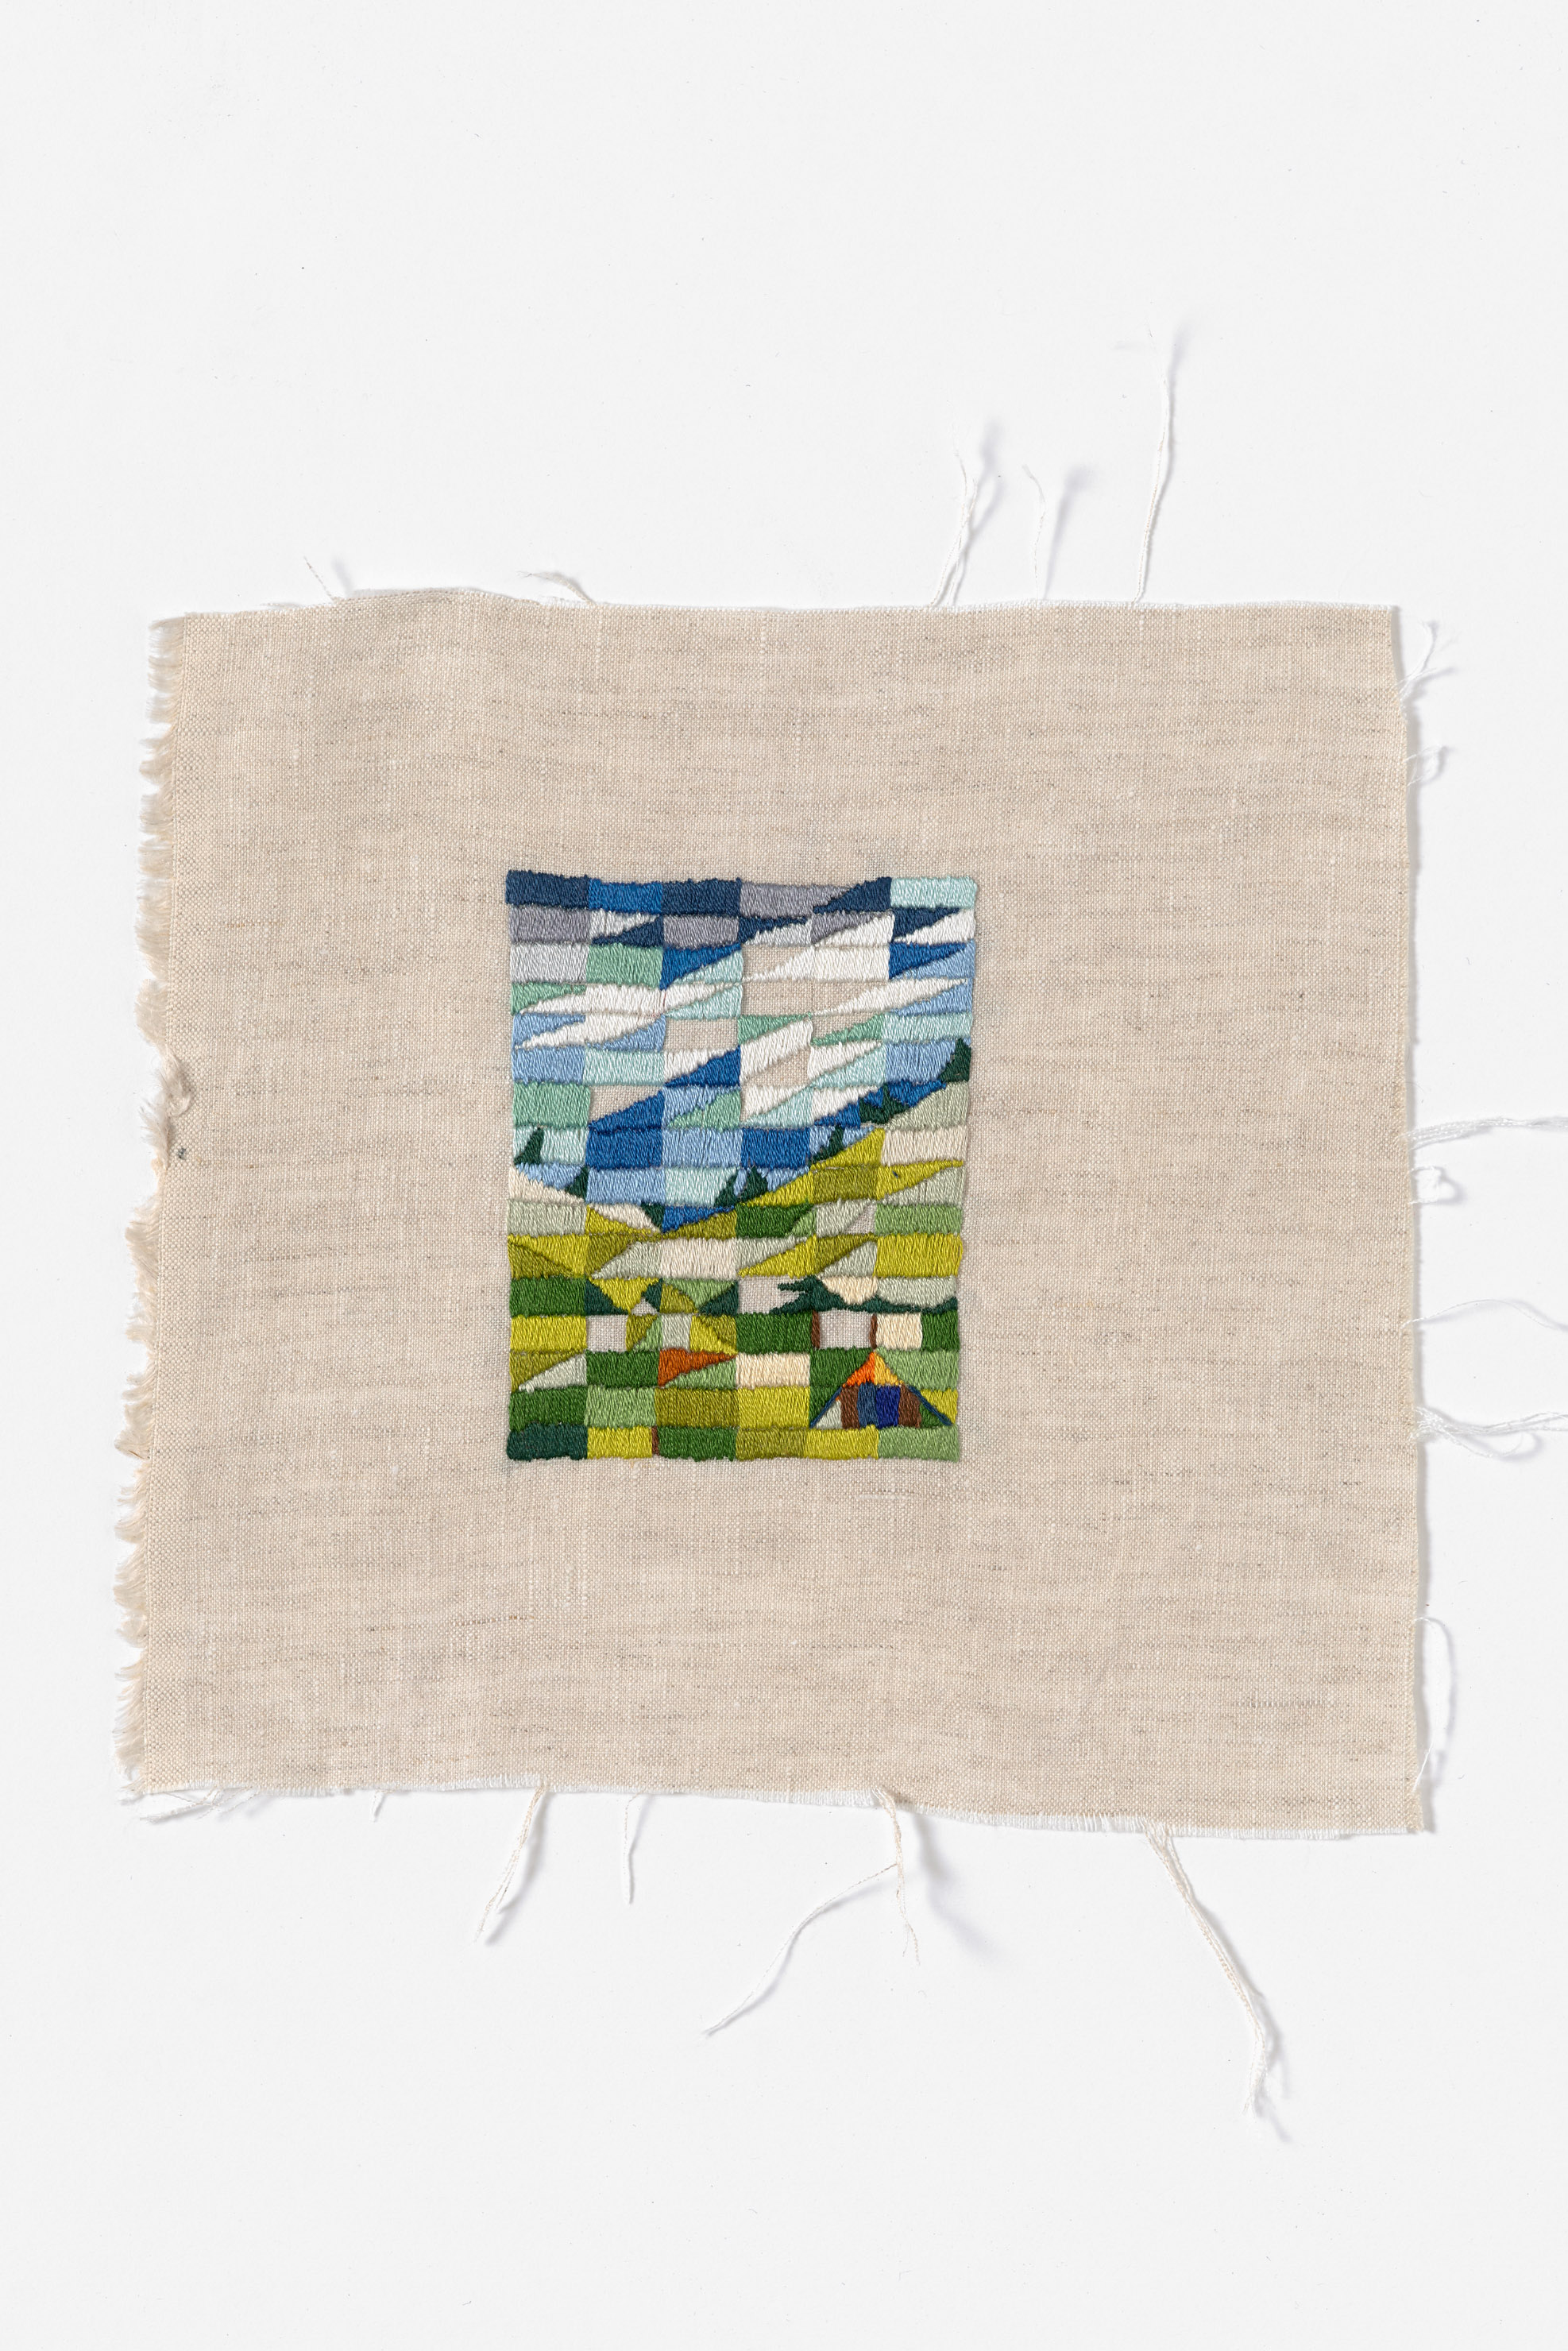 Glen Forbes  2014 Cotton thread on linen 23 x 21cm